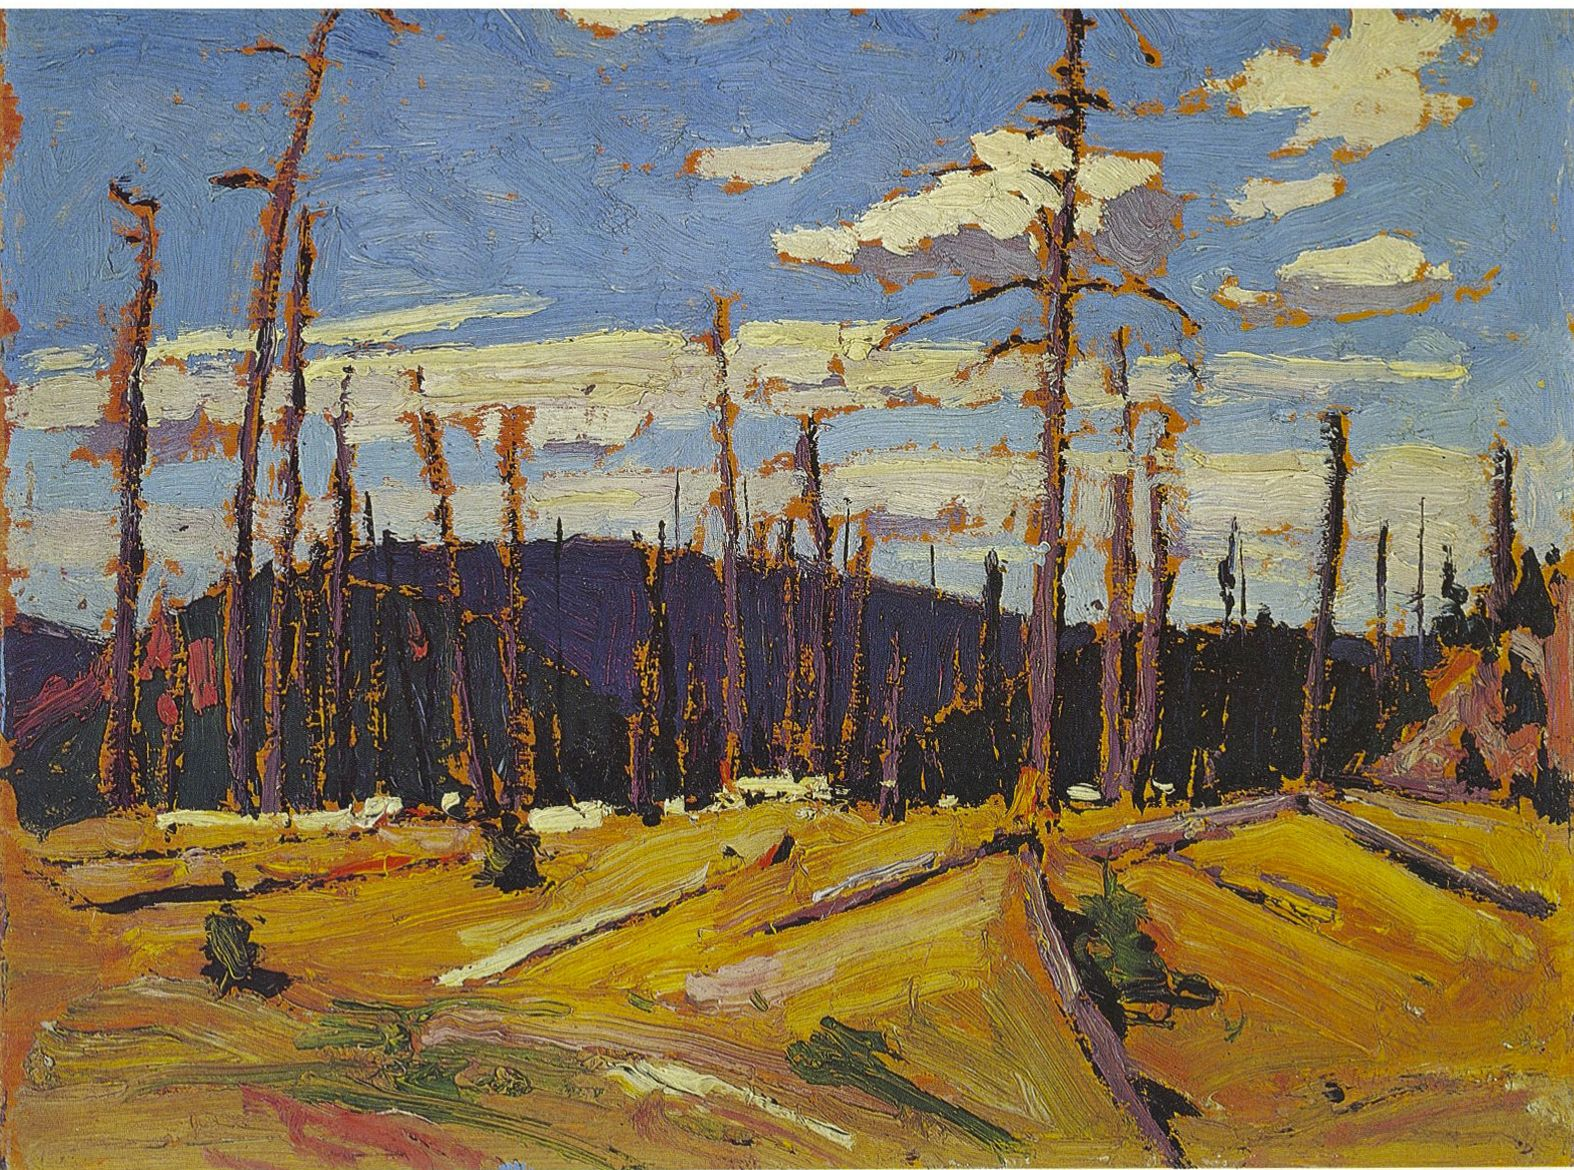 Tom Thomson Catalogue Raisonné | Burnt-Over Forest, Spring 1916 (1916.40) | Catalogue entry